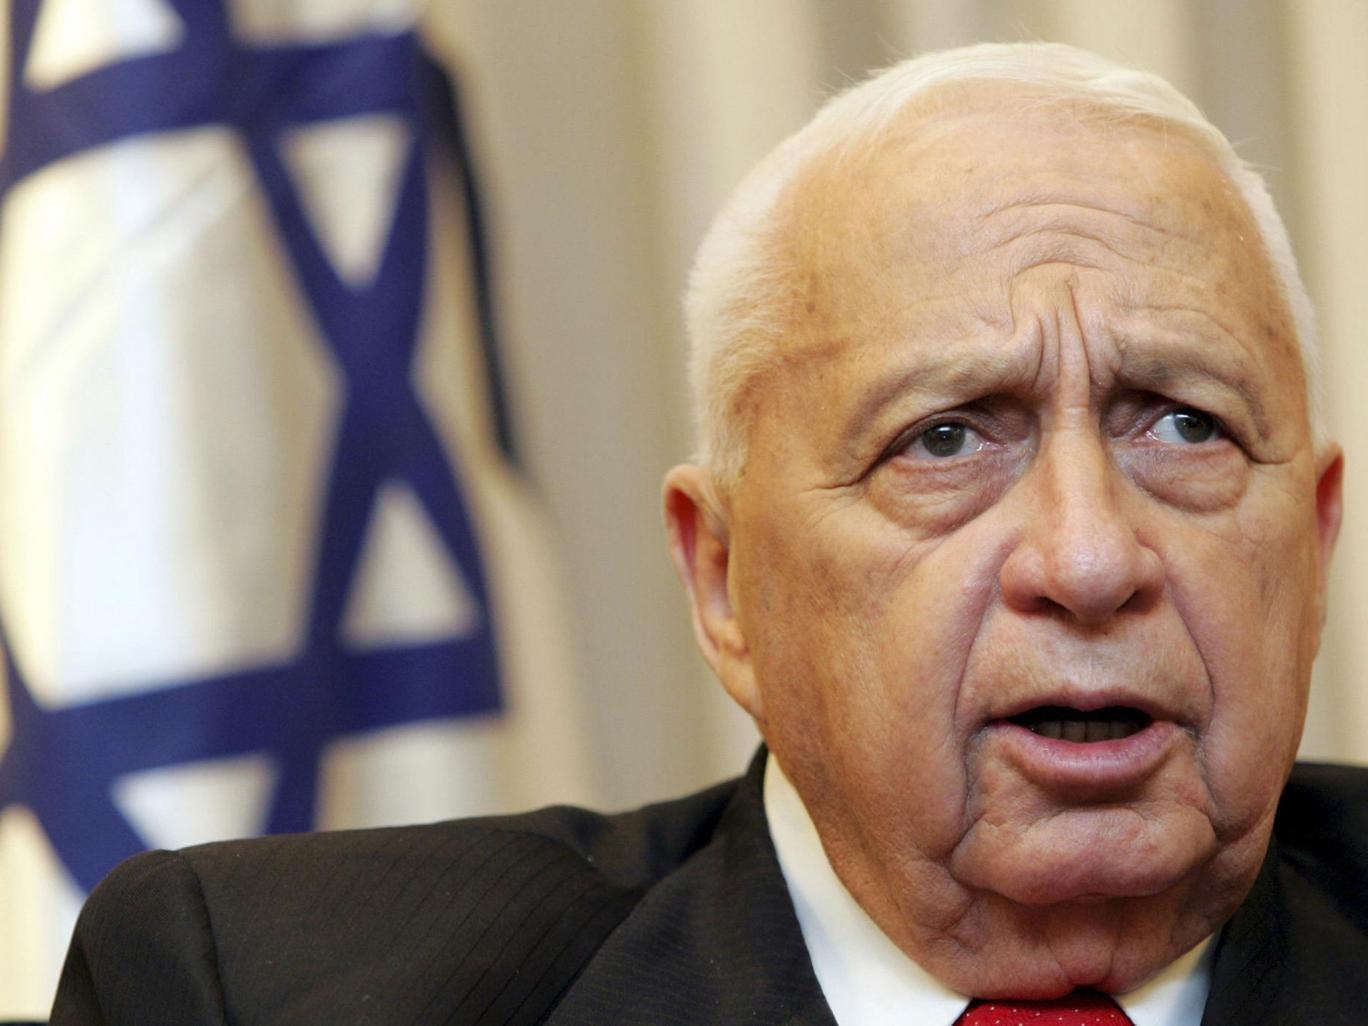 Former Israeli prime minister Ariel Sharon pictured in 2005